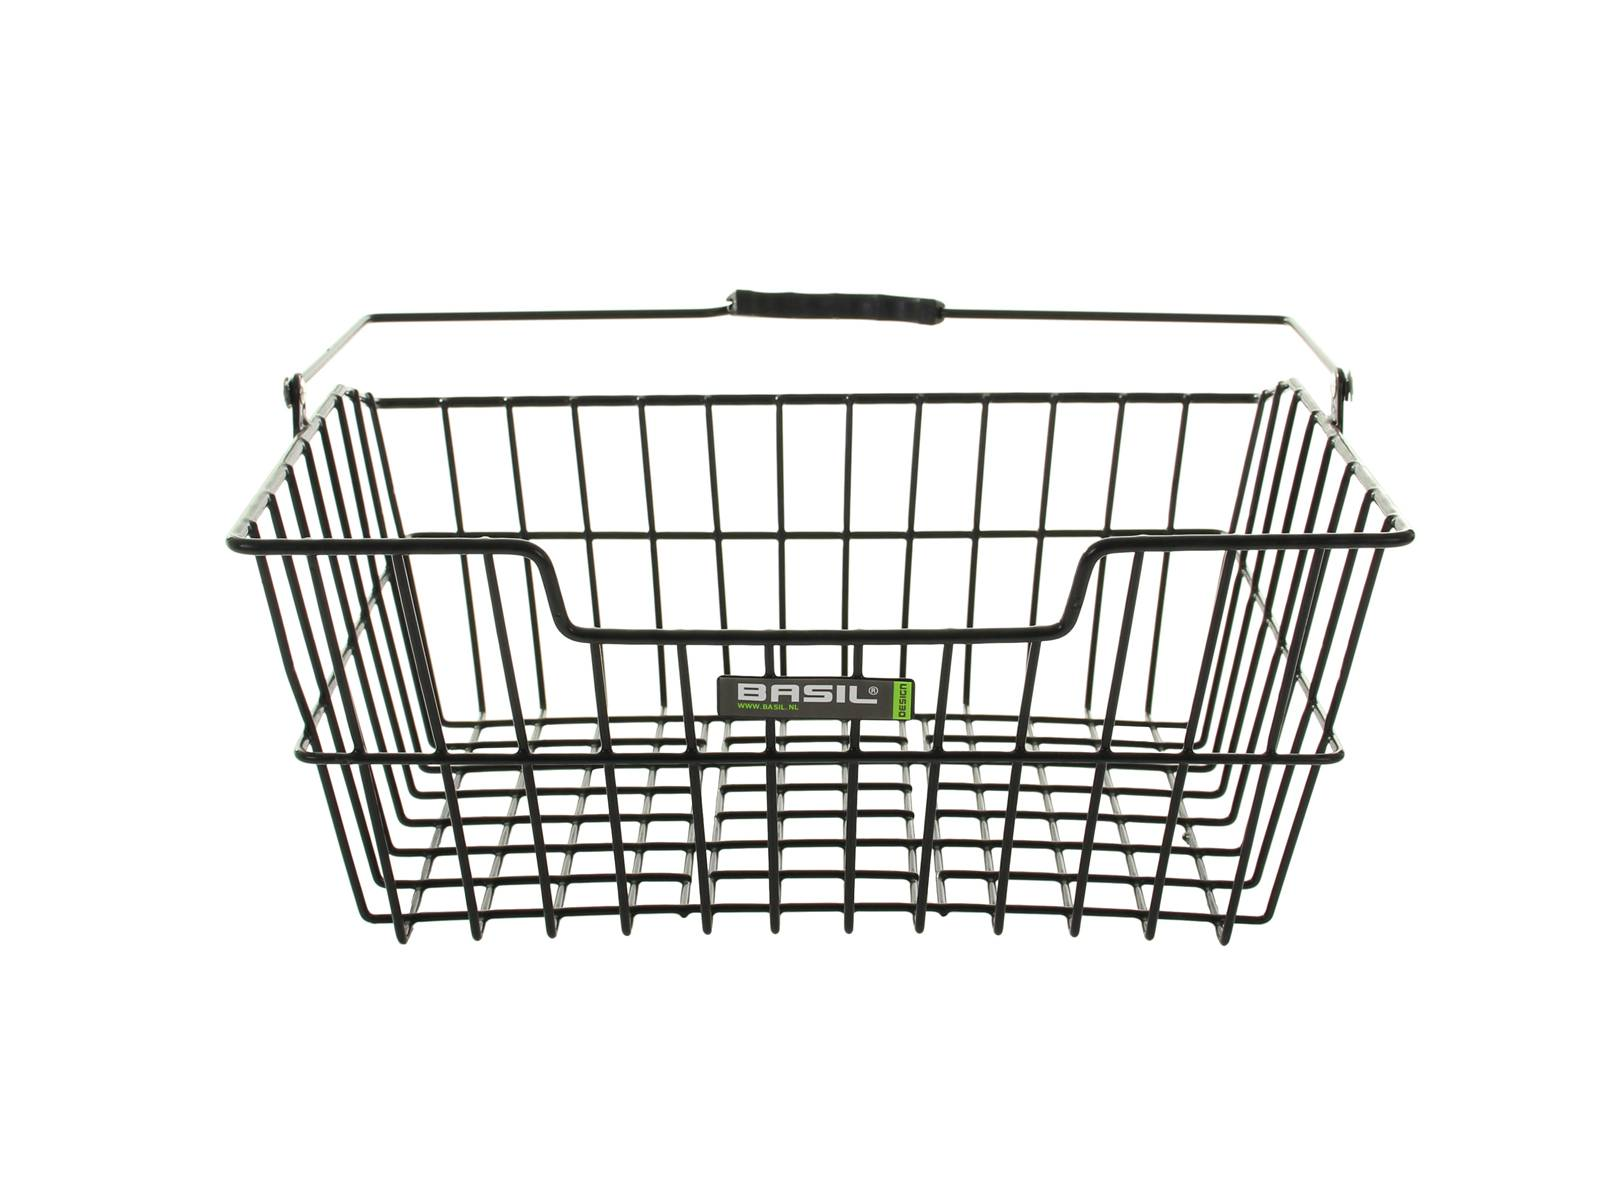 basil hr korb cairo flex schwarz fahrradkomfort. Black Bedroom Furniture Sets. Home Design Ideas